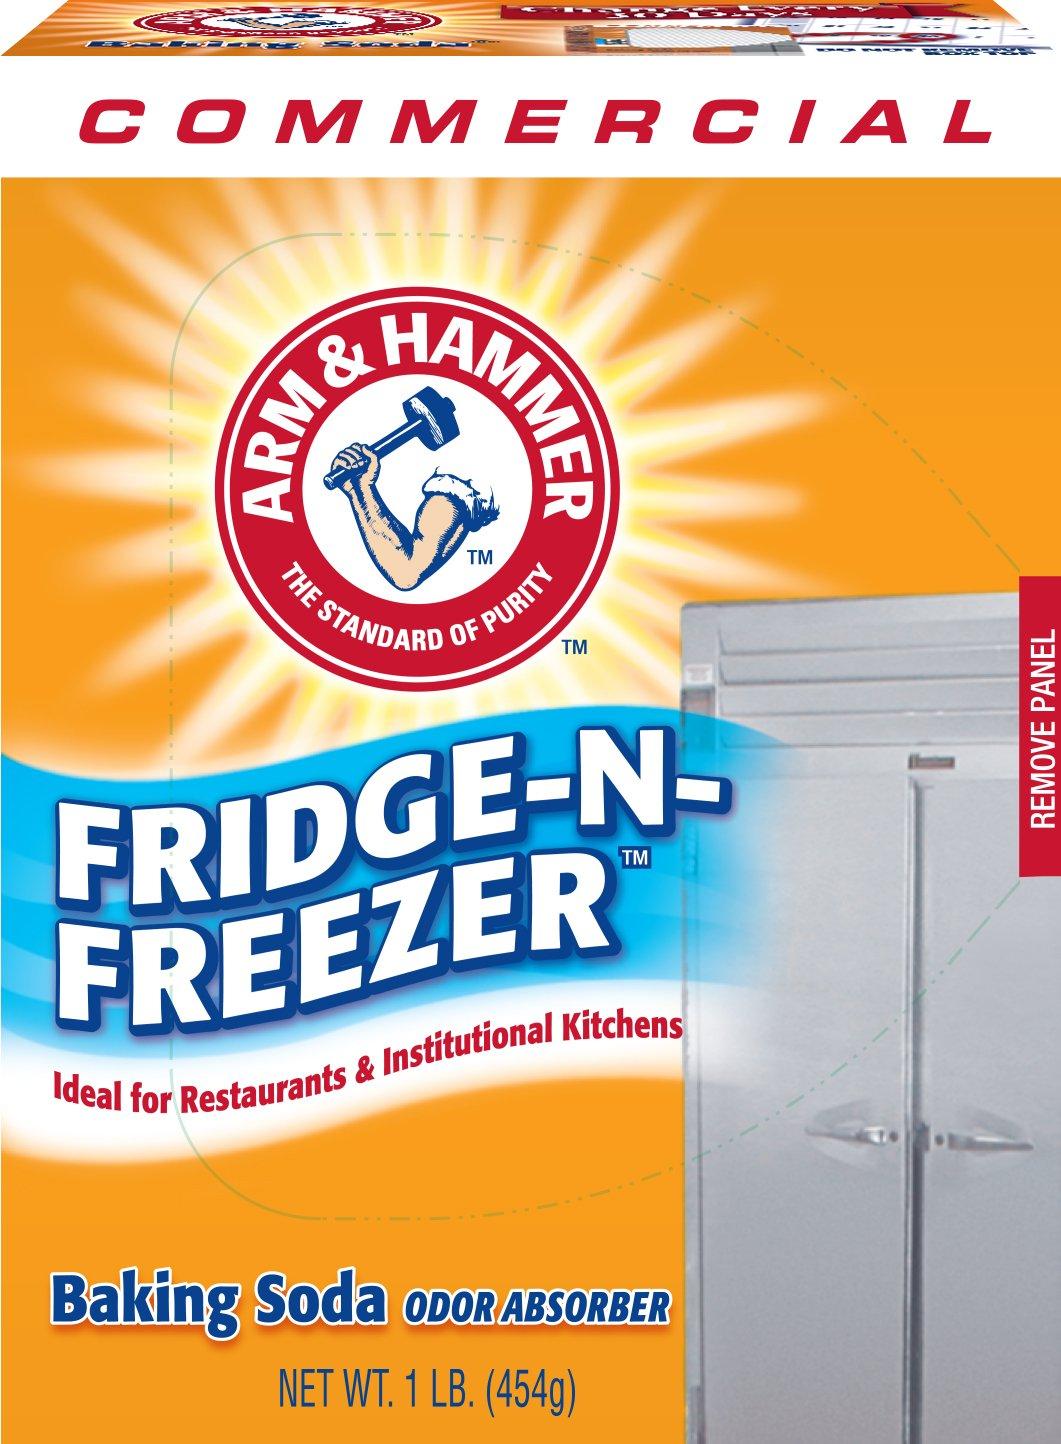 OFFicial Arm Hammer 3320084011CT Fridge-N-Freezer Baking Pack Soda SALENEW very popular! Uns